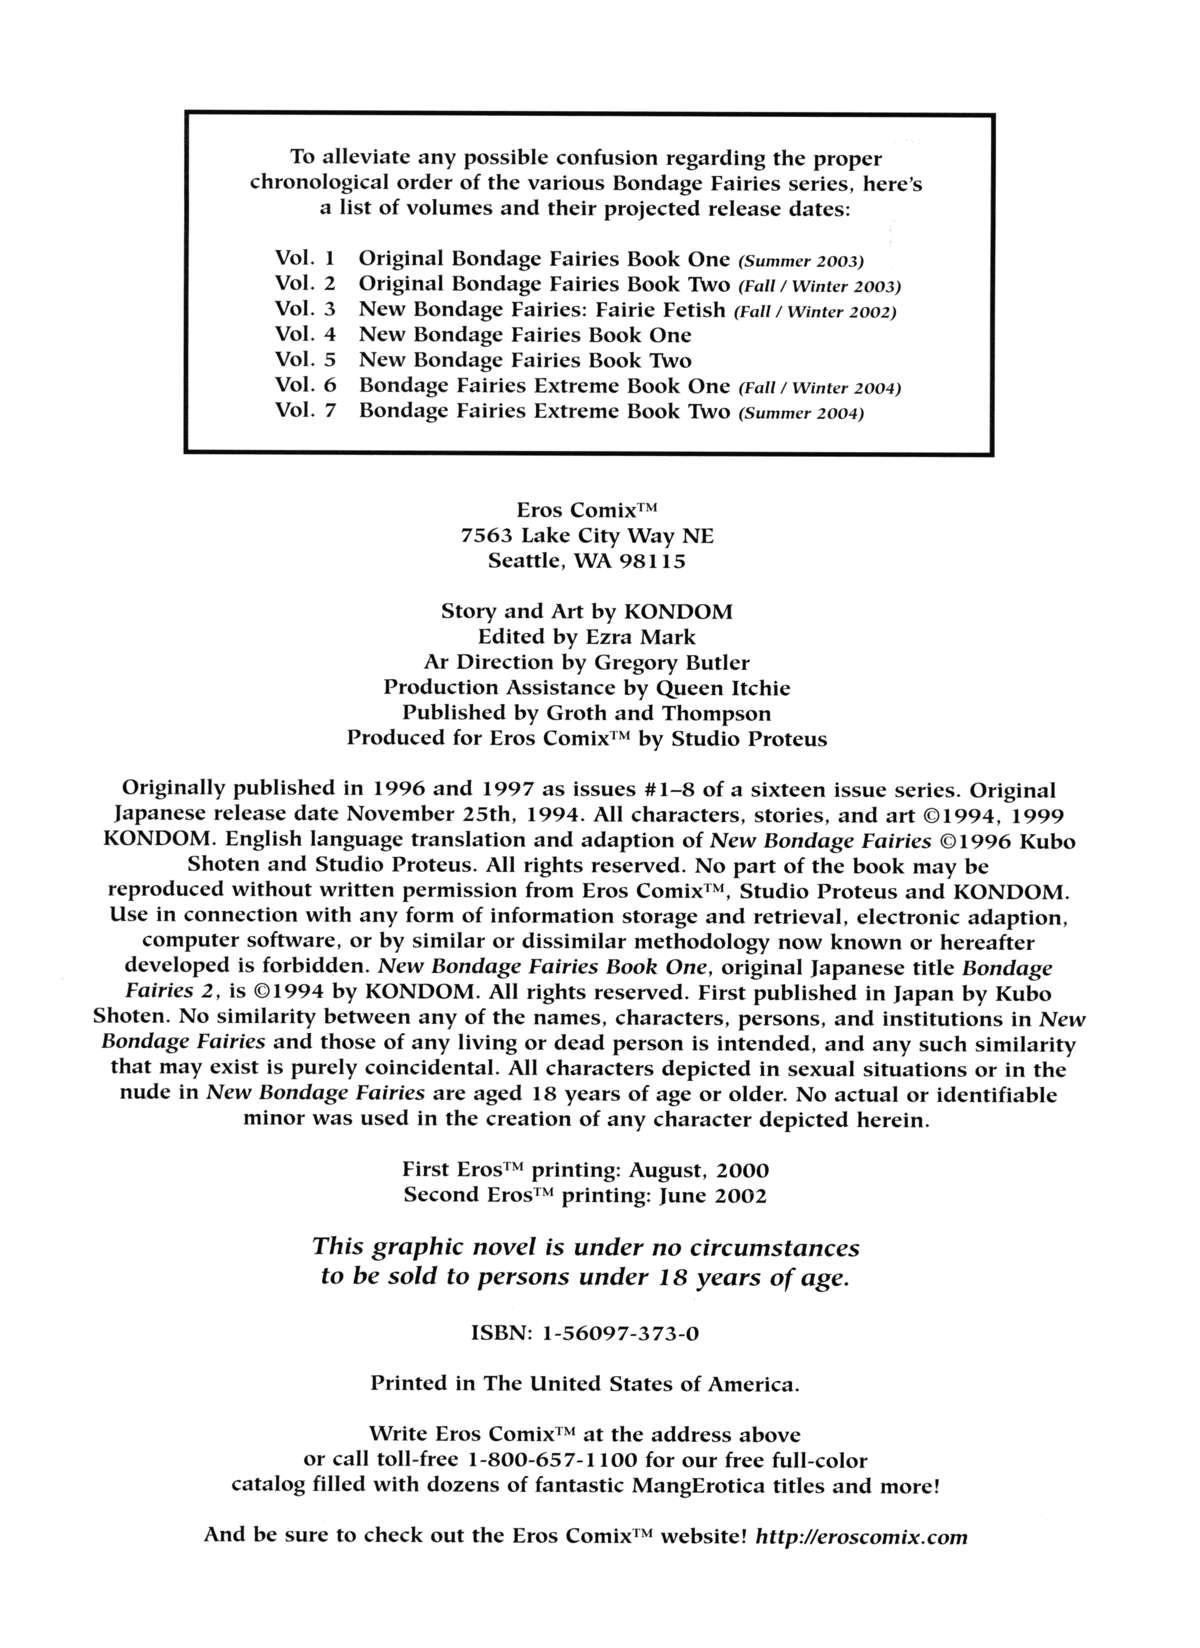 The New Bondage Fairies - Book One 3